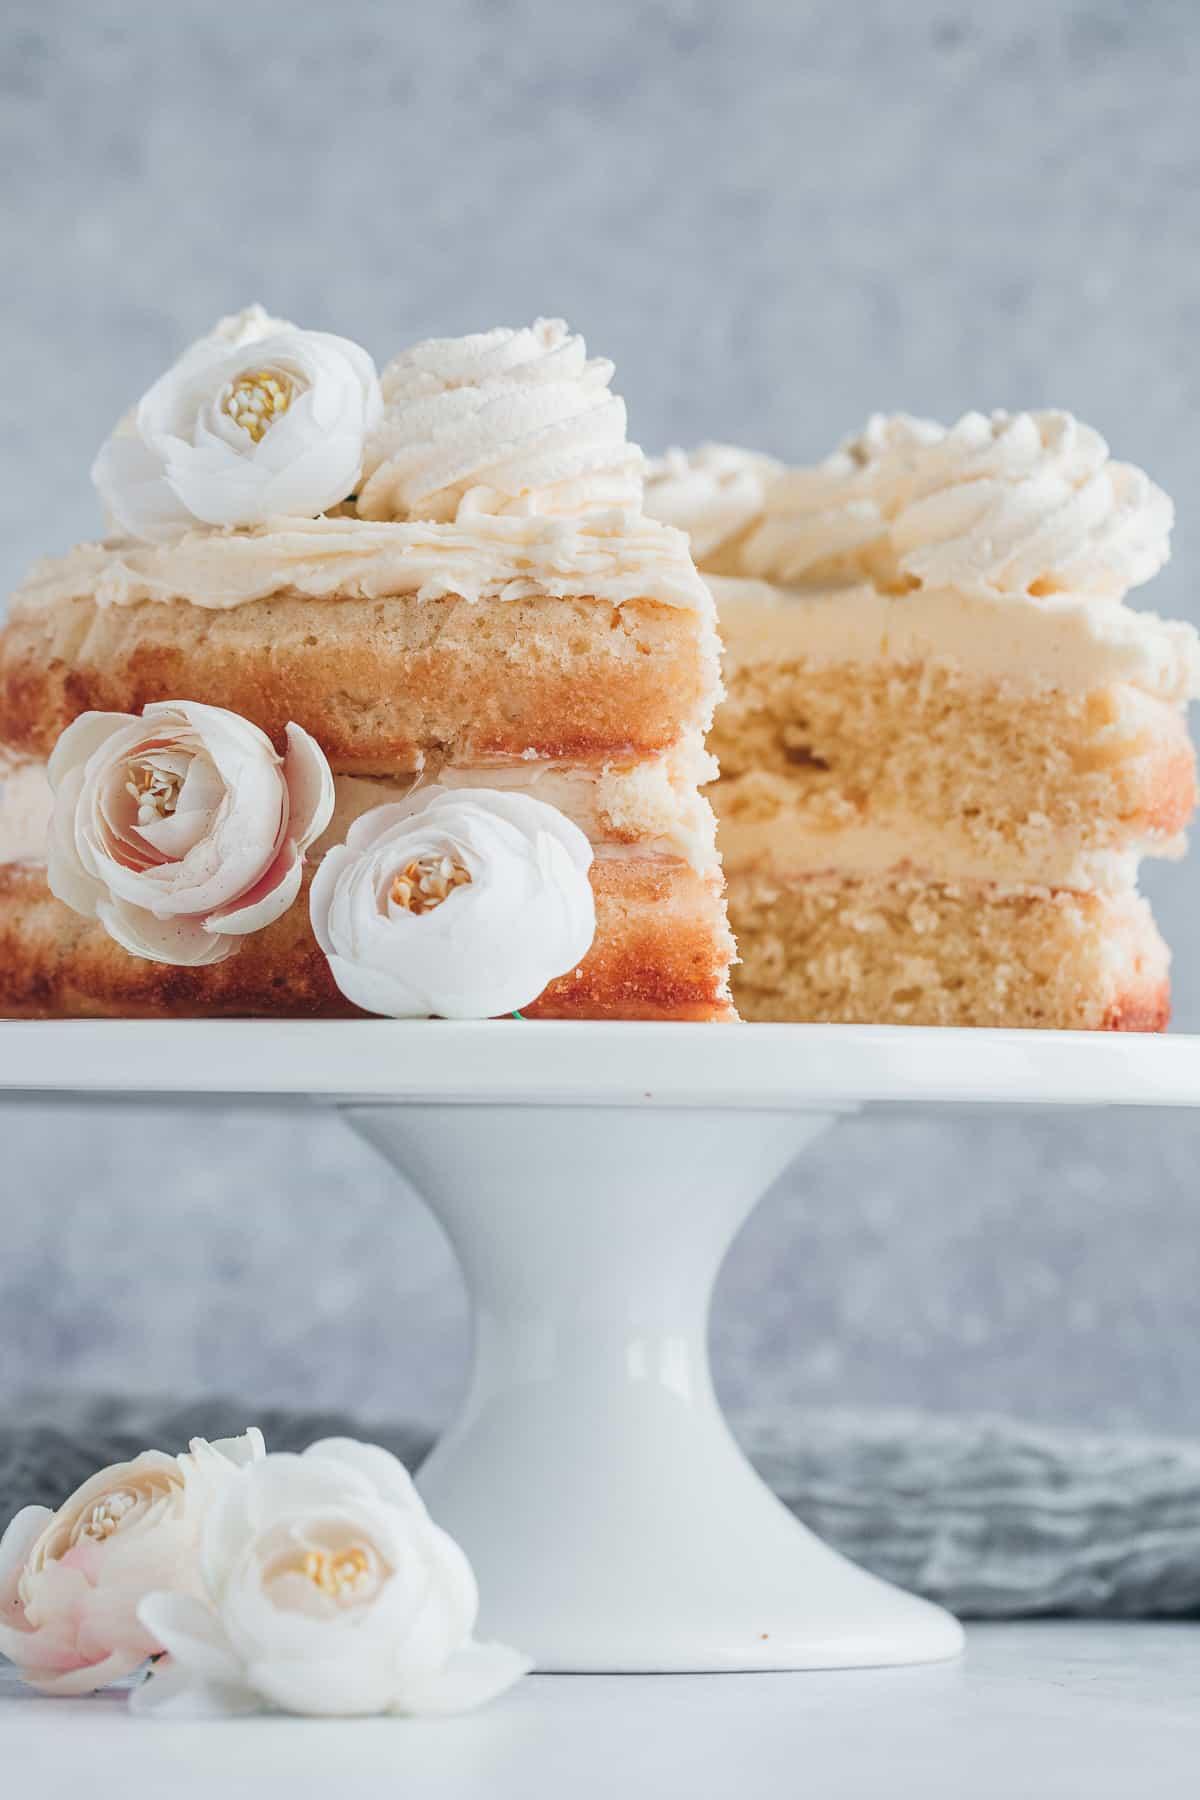 Lemon sponge cake with a slice cut out.